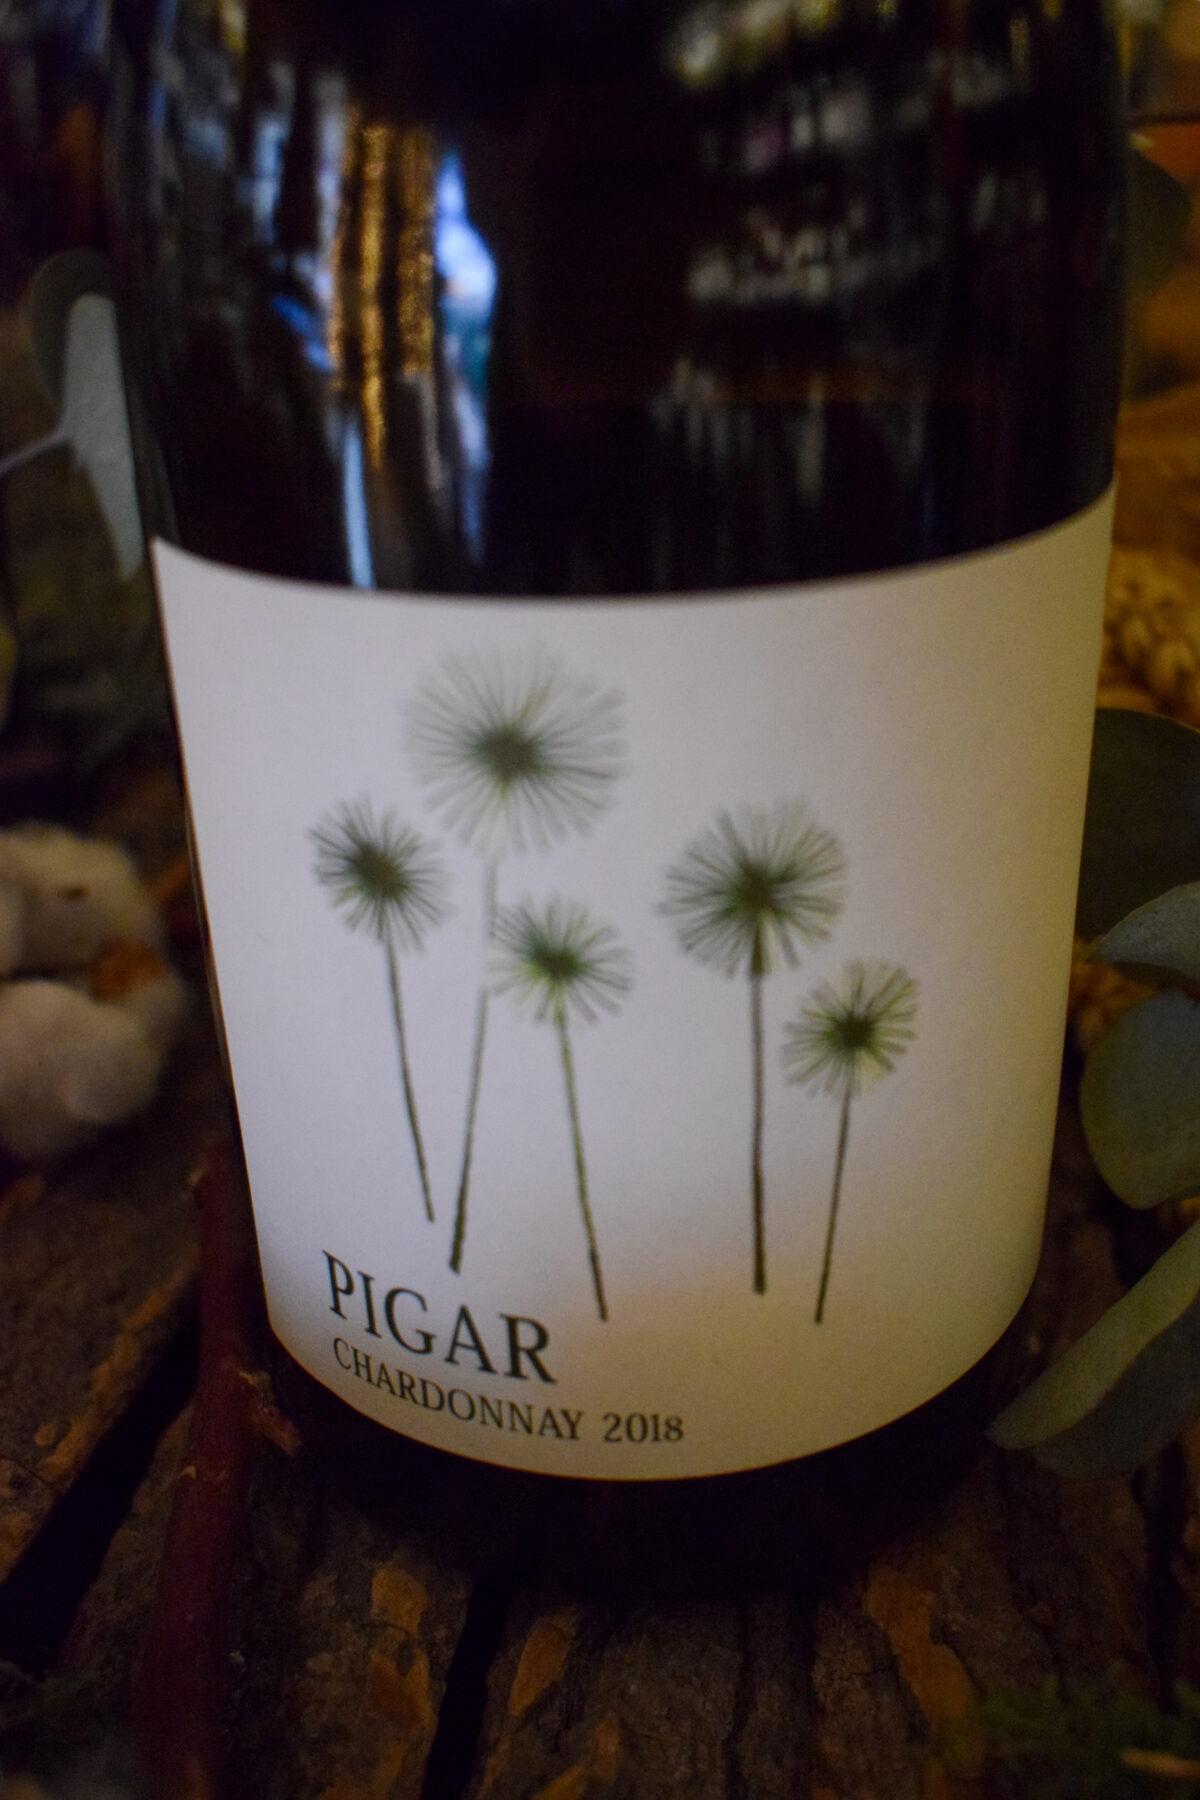 Chardonnay Pigar 2018